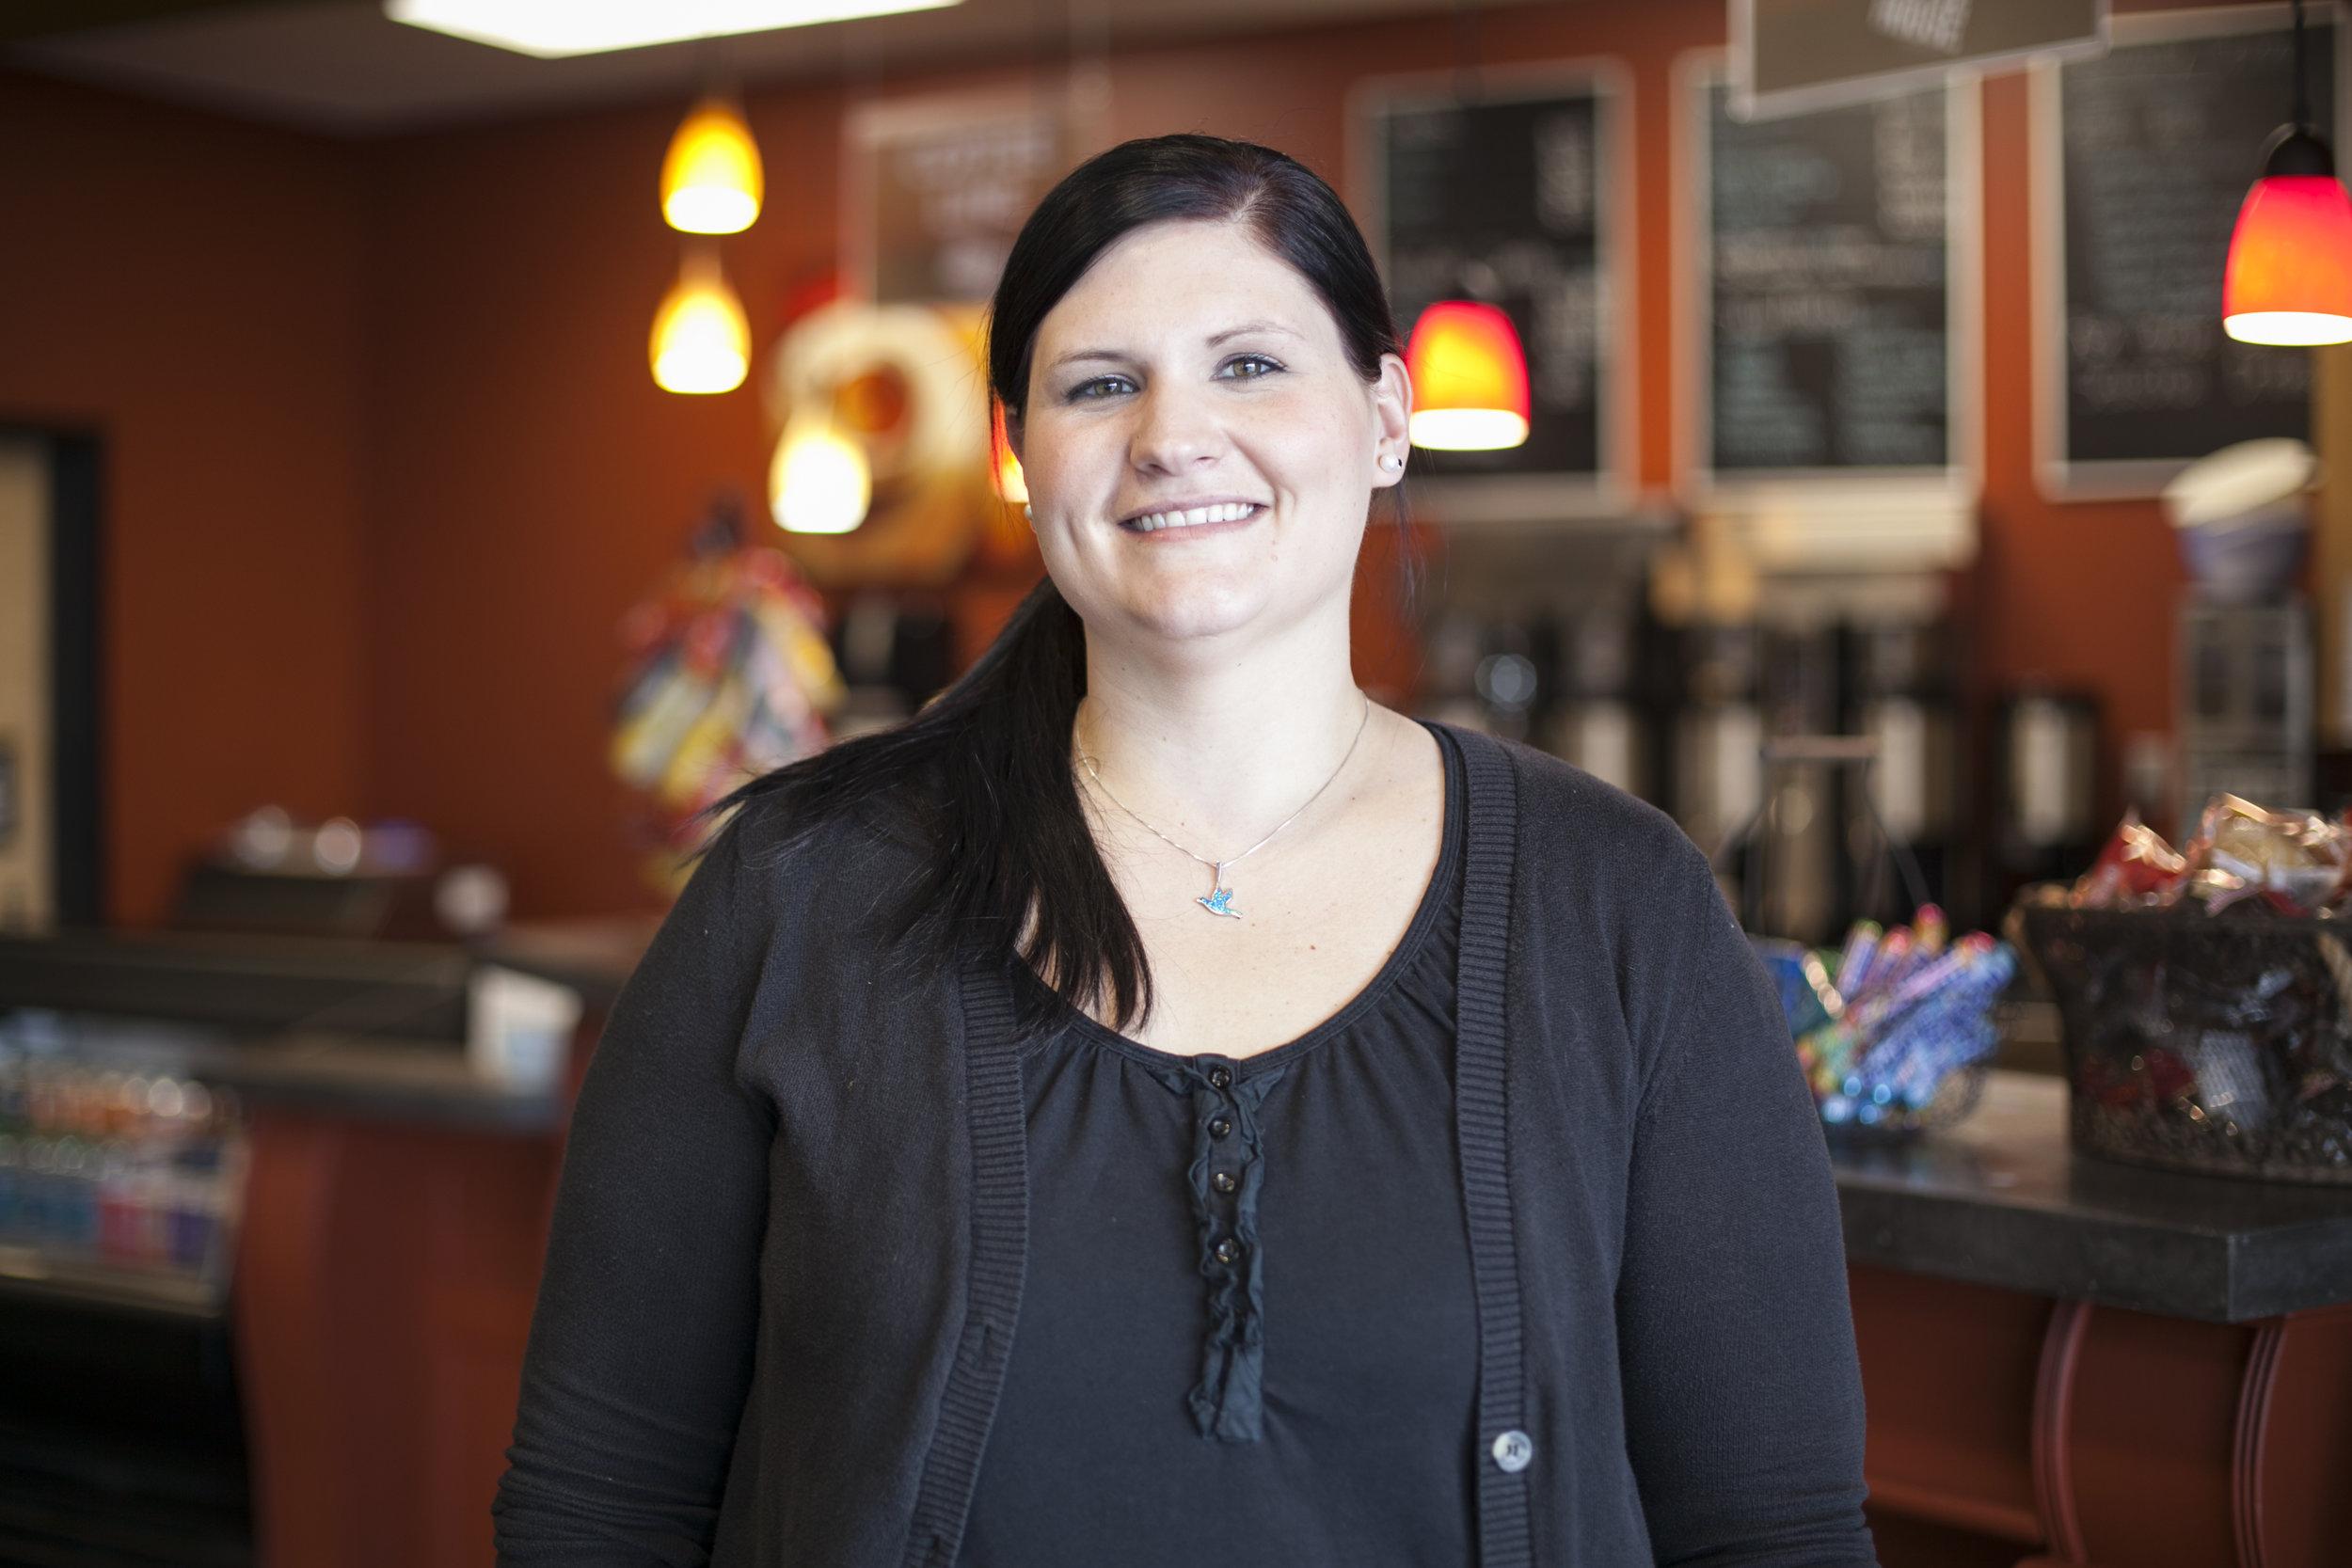 Rachel Leonard    Coffee House Manager    Email: rachel.leonard@crossroadswired.com